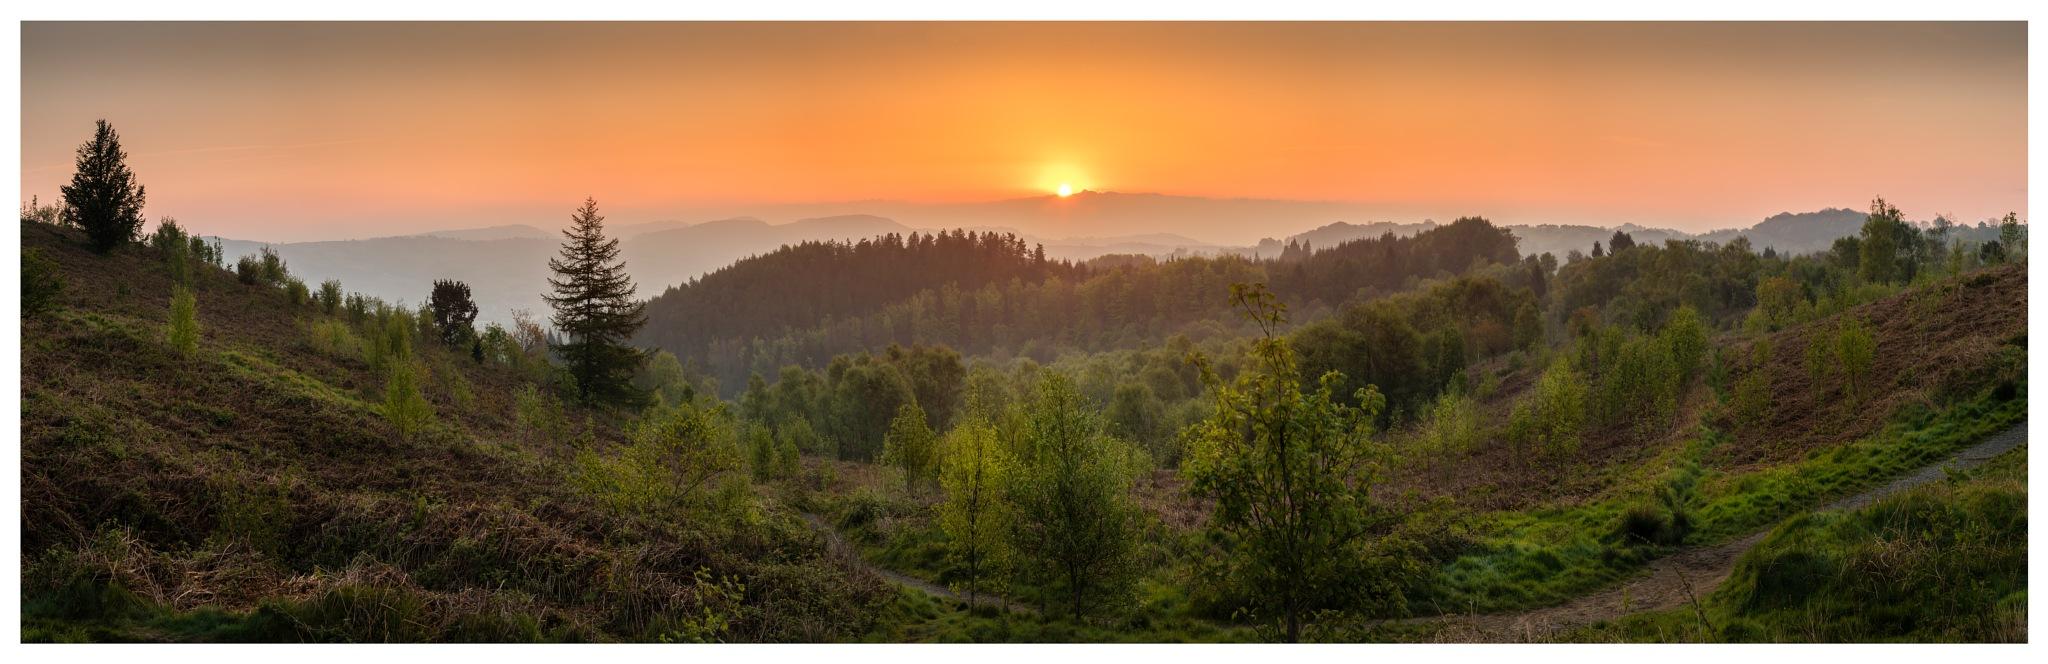 Sunrise Pano by Martin Roberts